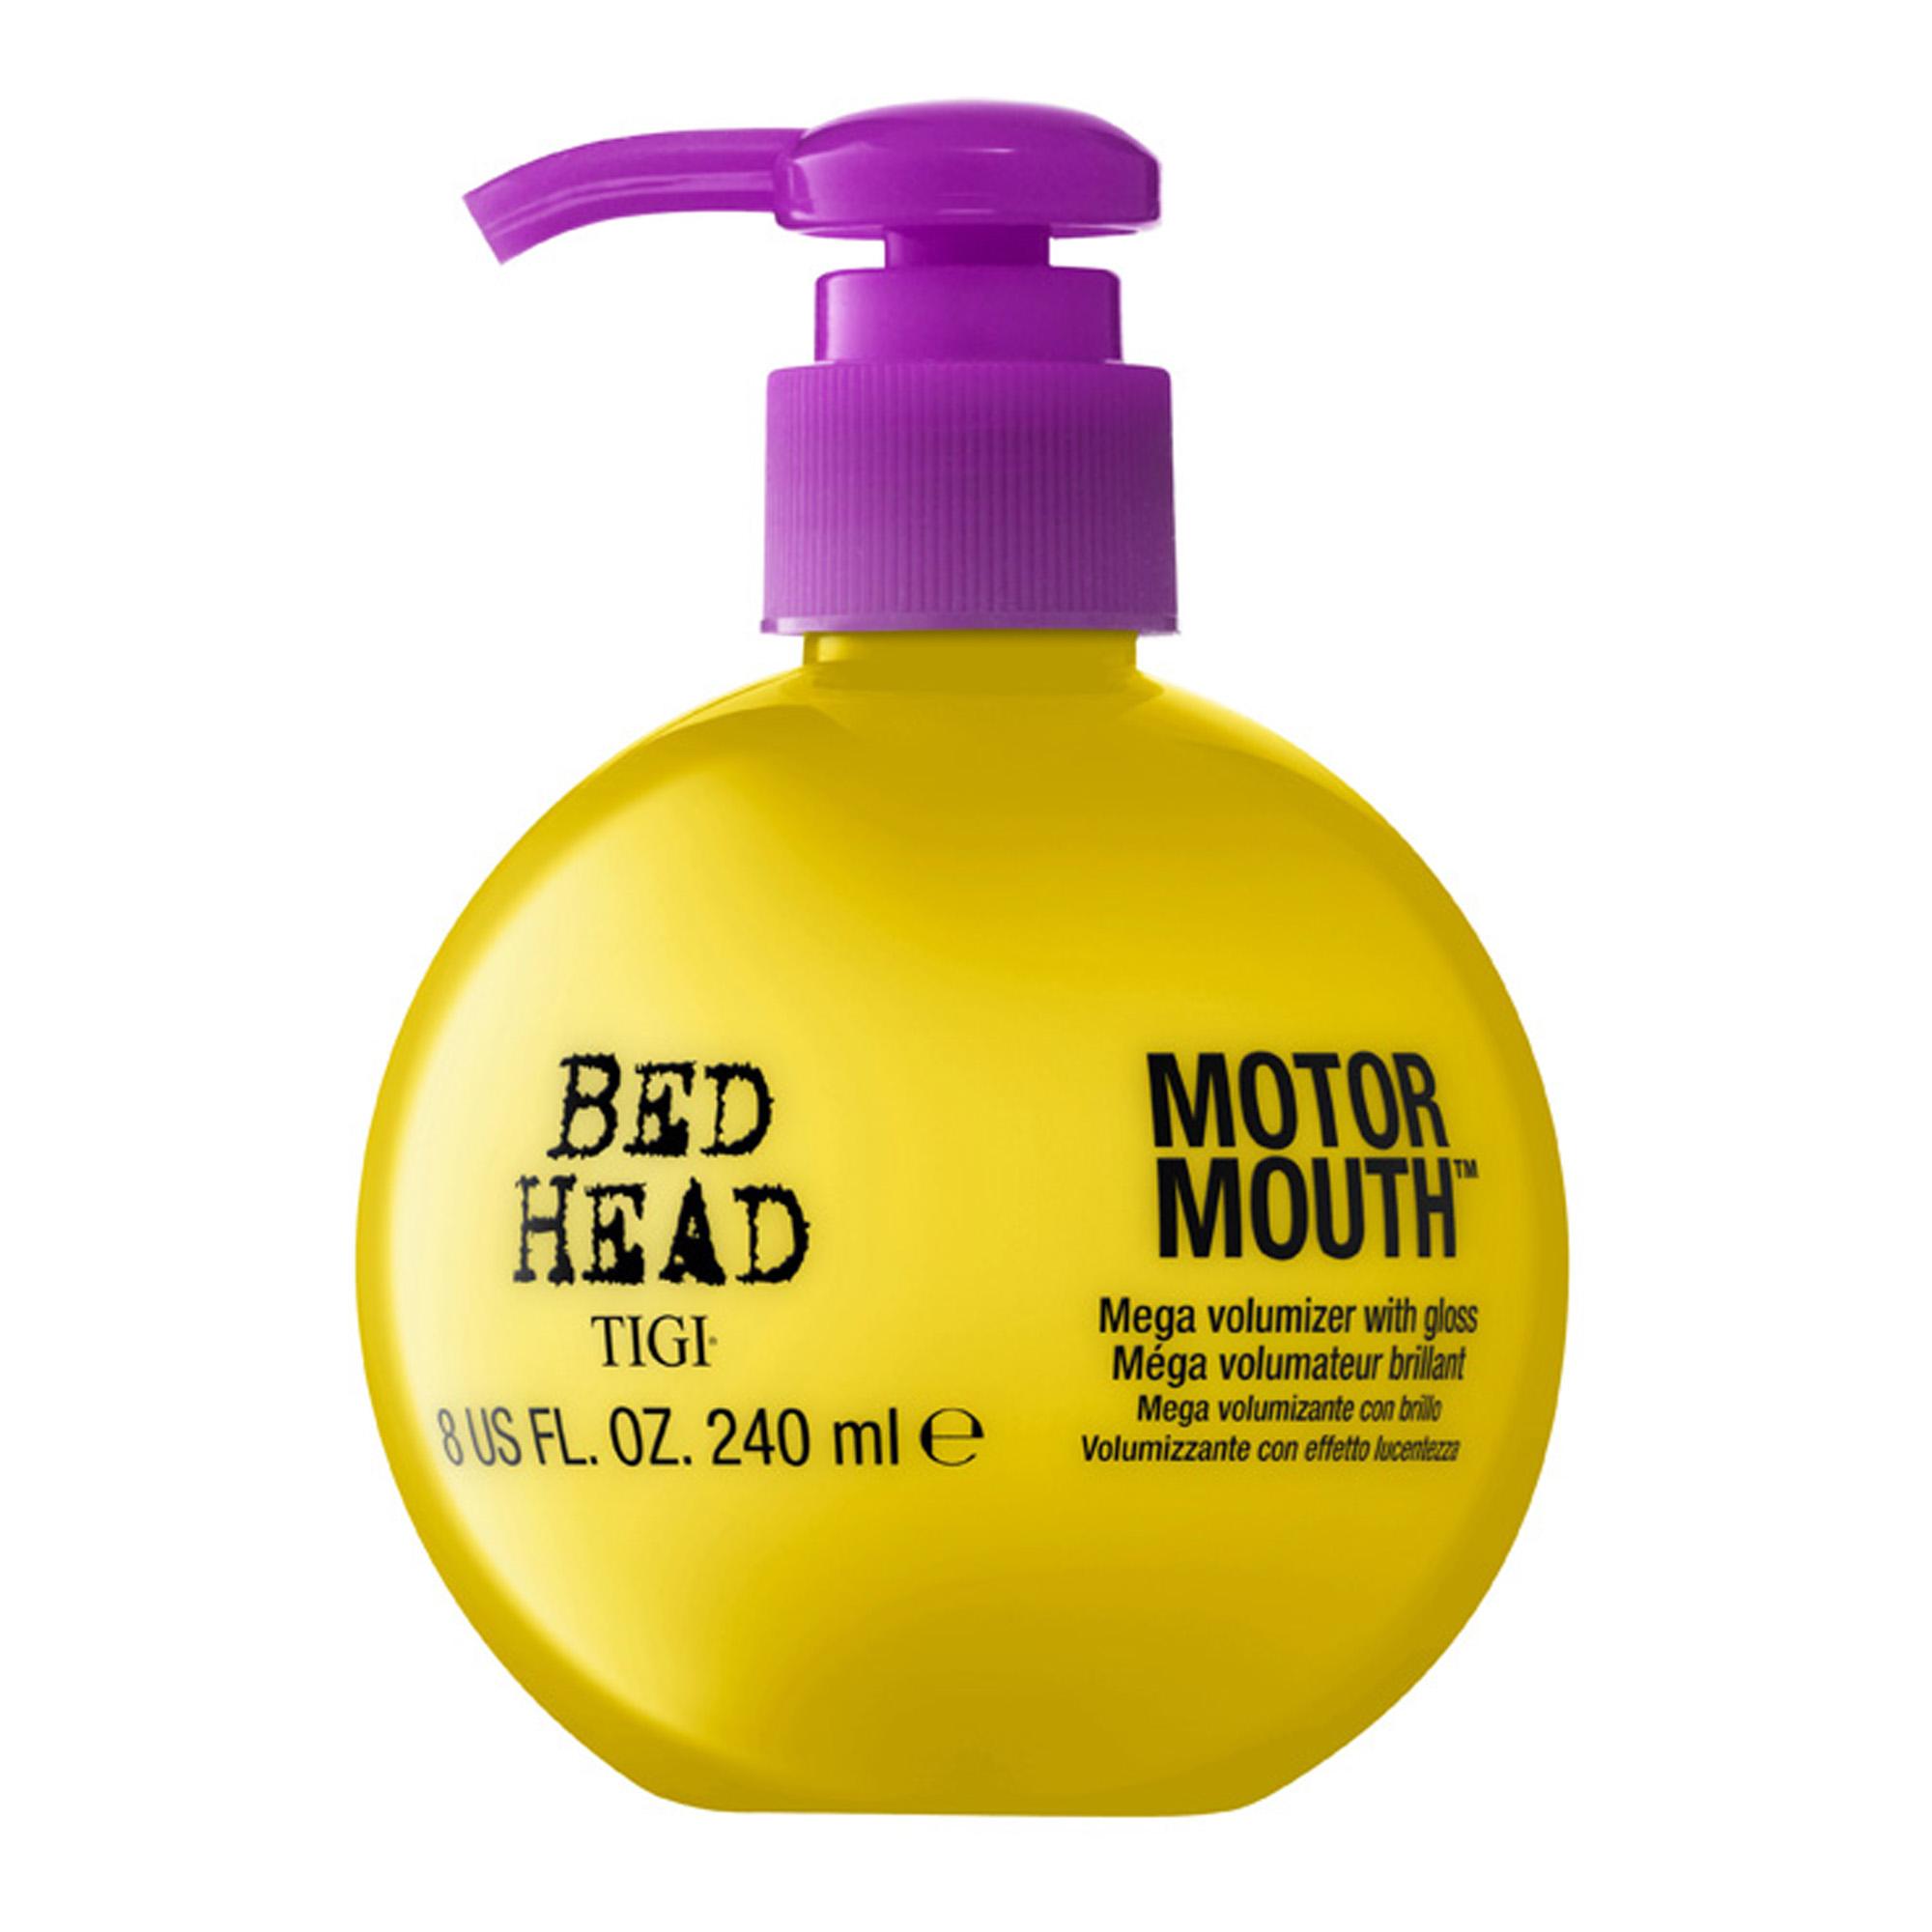 TIGI - Bed Head Motor Mouth Volume Creme 240 ml